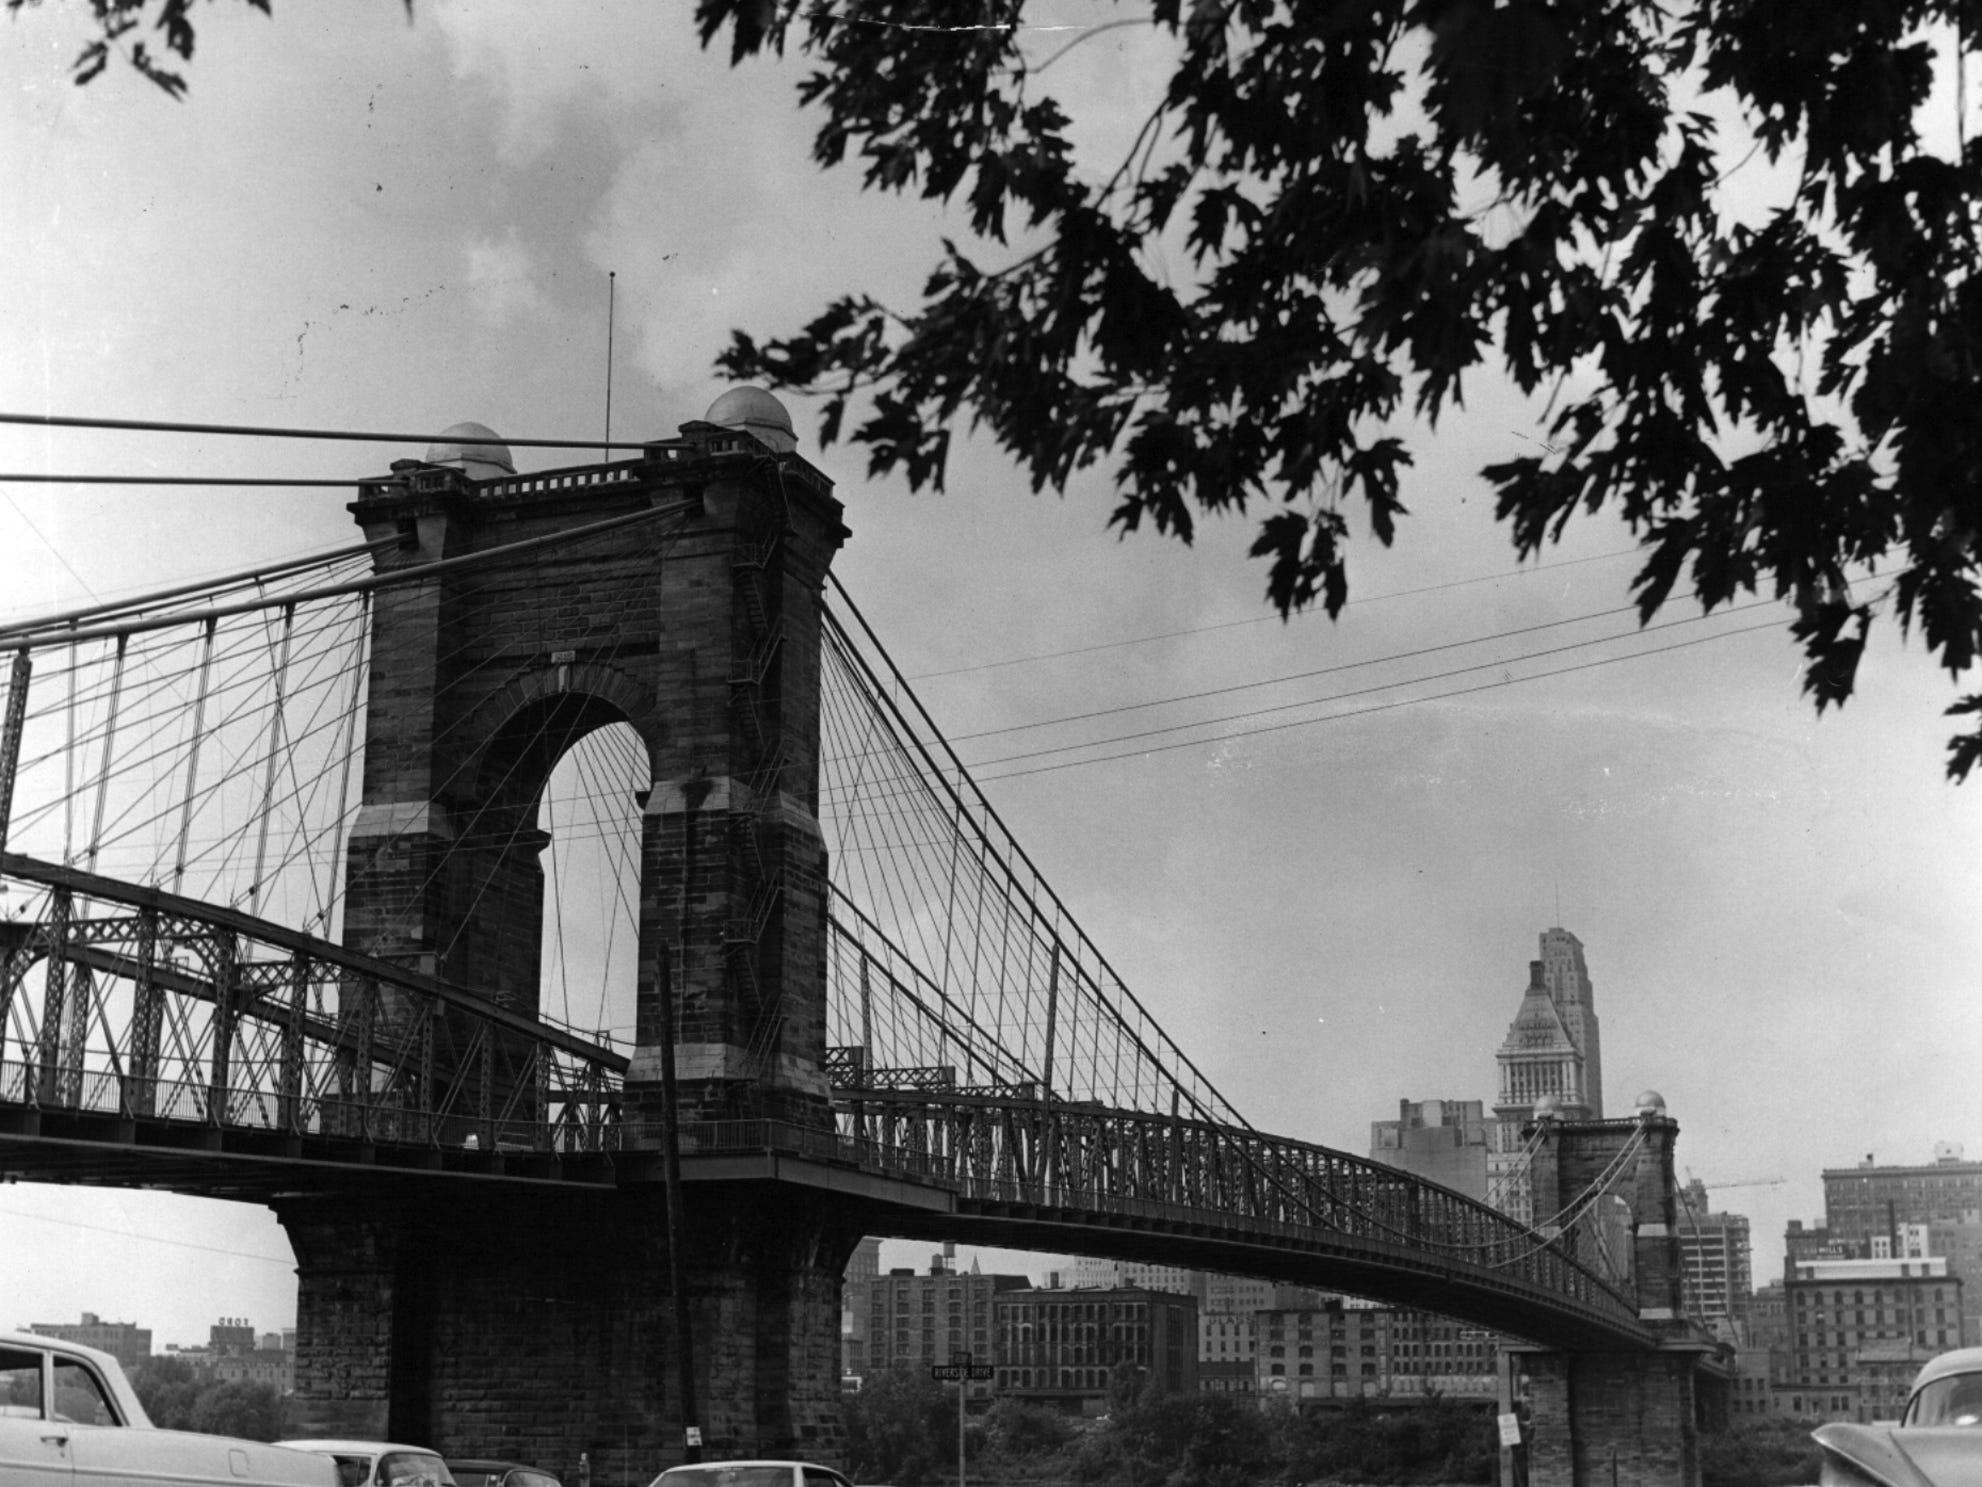 SEPTEMBER 1966: John A. Roebling Suspension Bridge. The Enquirer/Ran Cochran scanned May 16, 2013